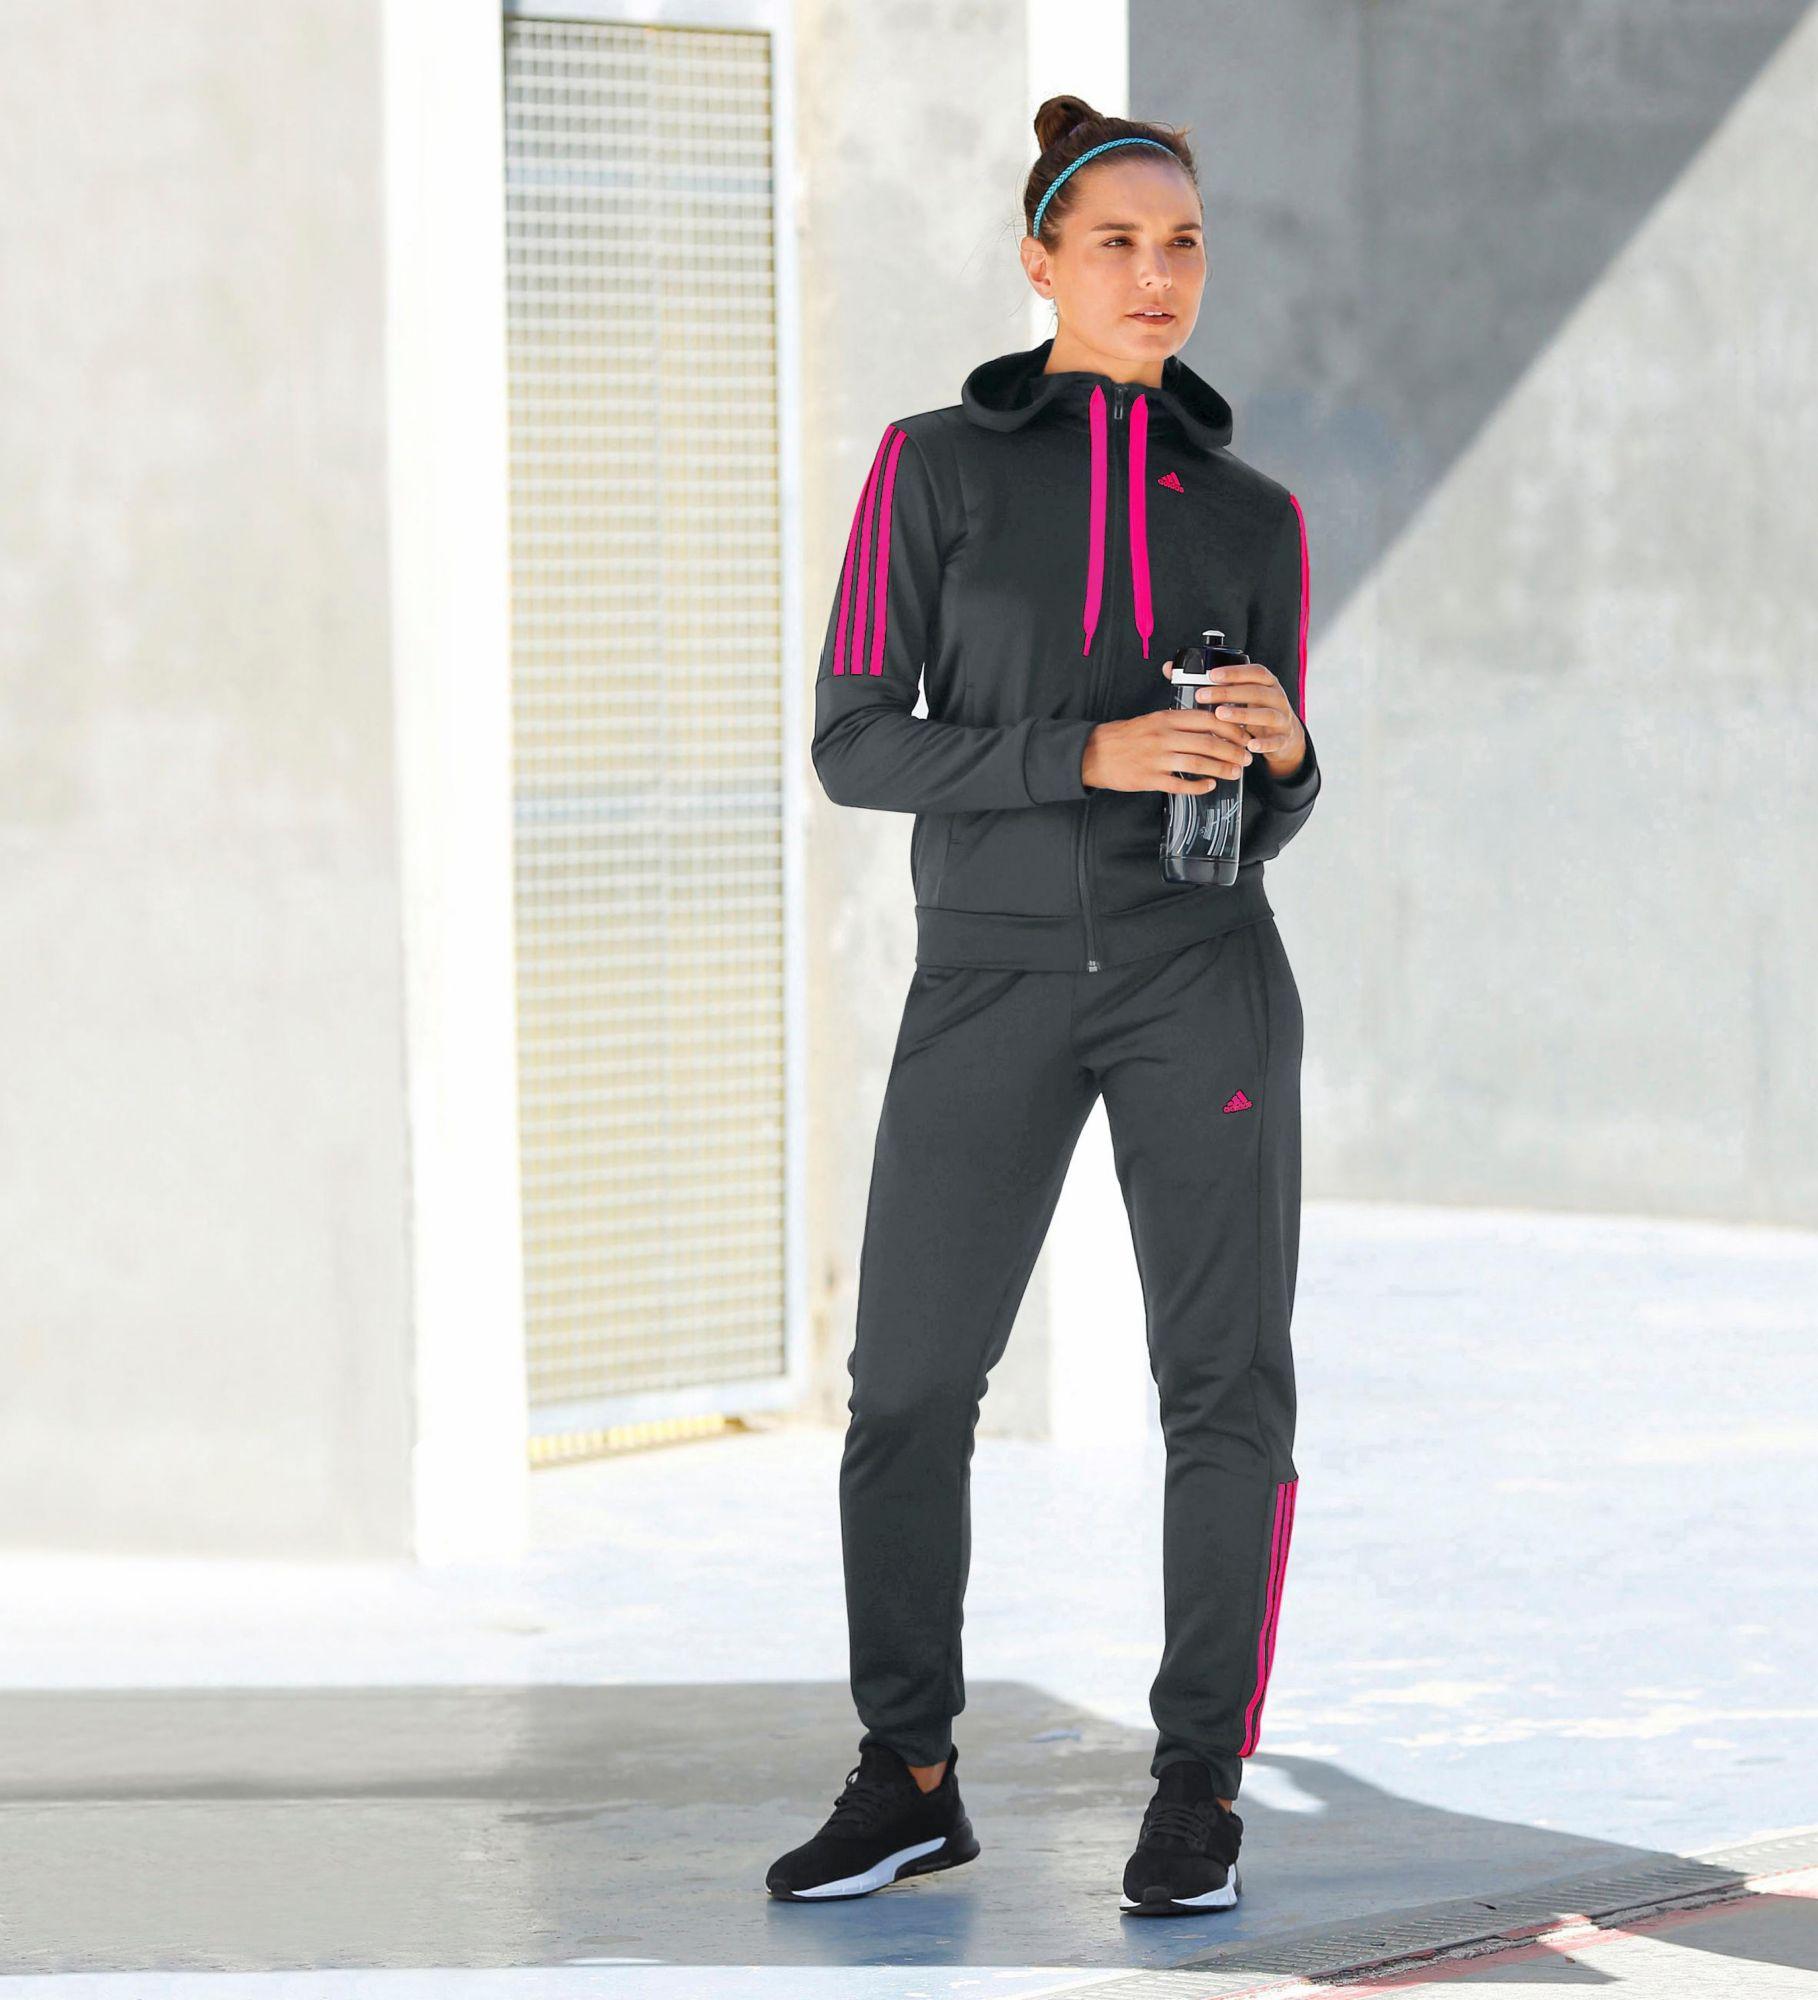 Adidas Weißer Trainingsanzug